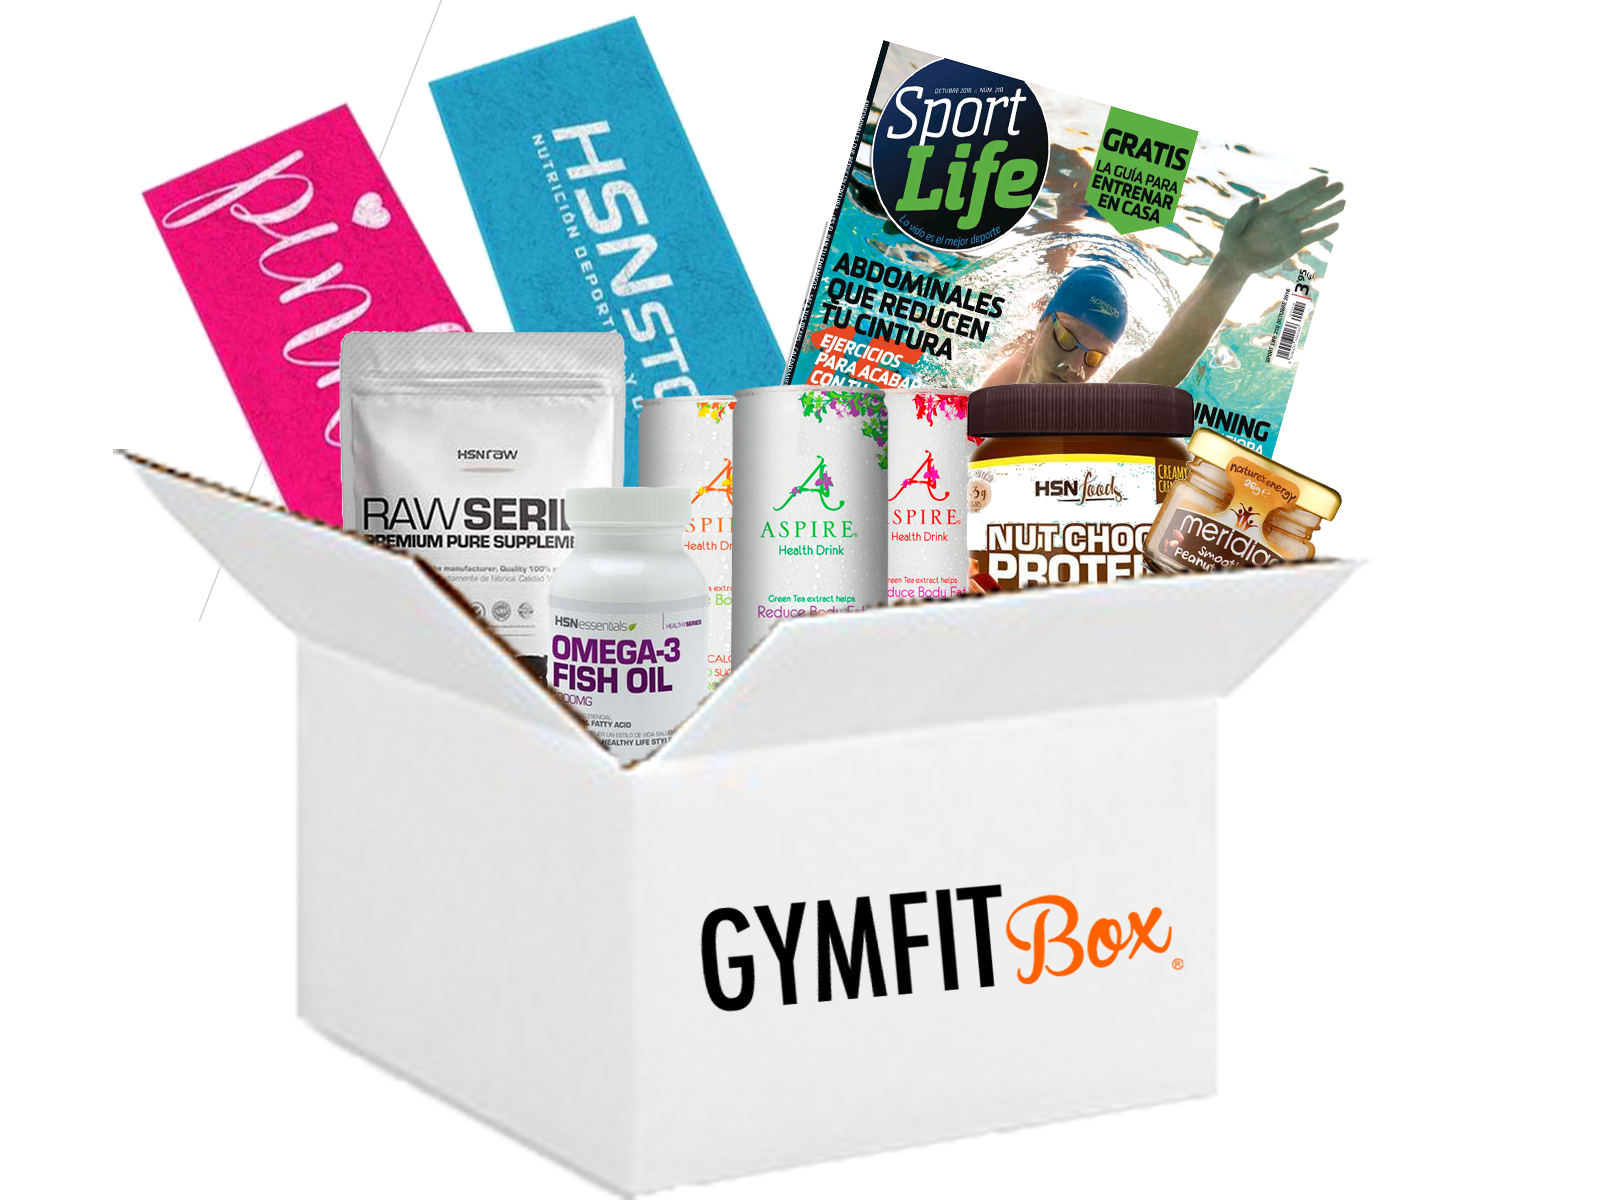 Gymfitbox Octubre 2106